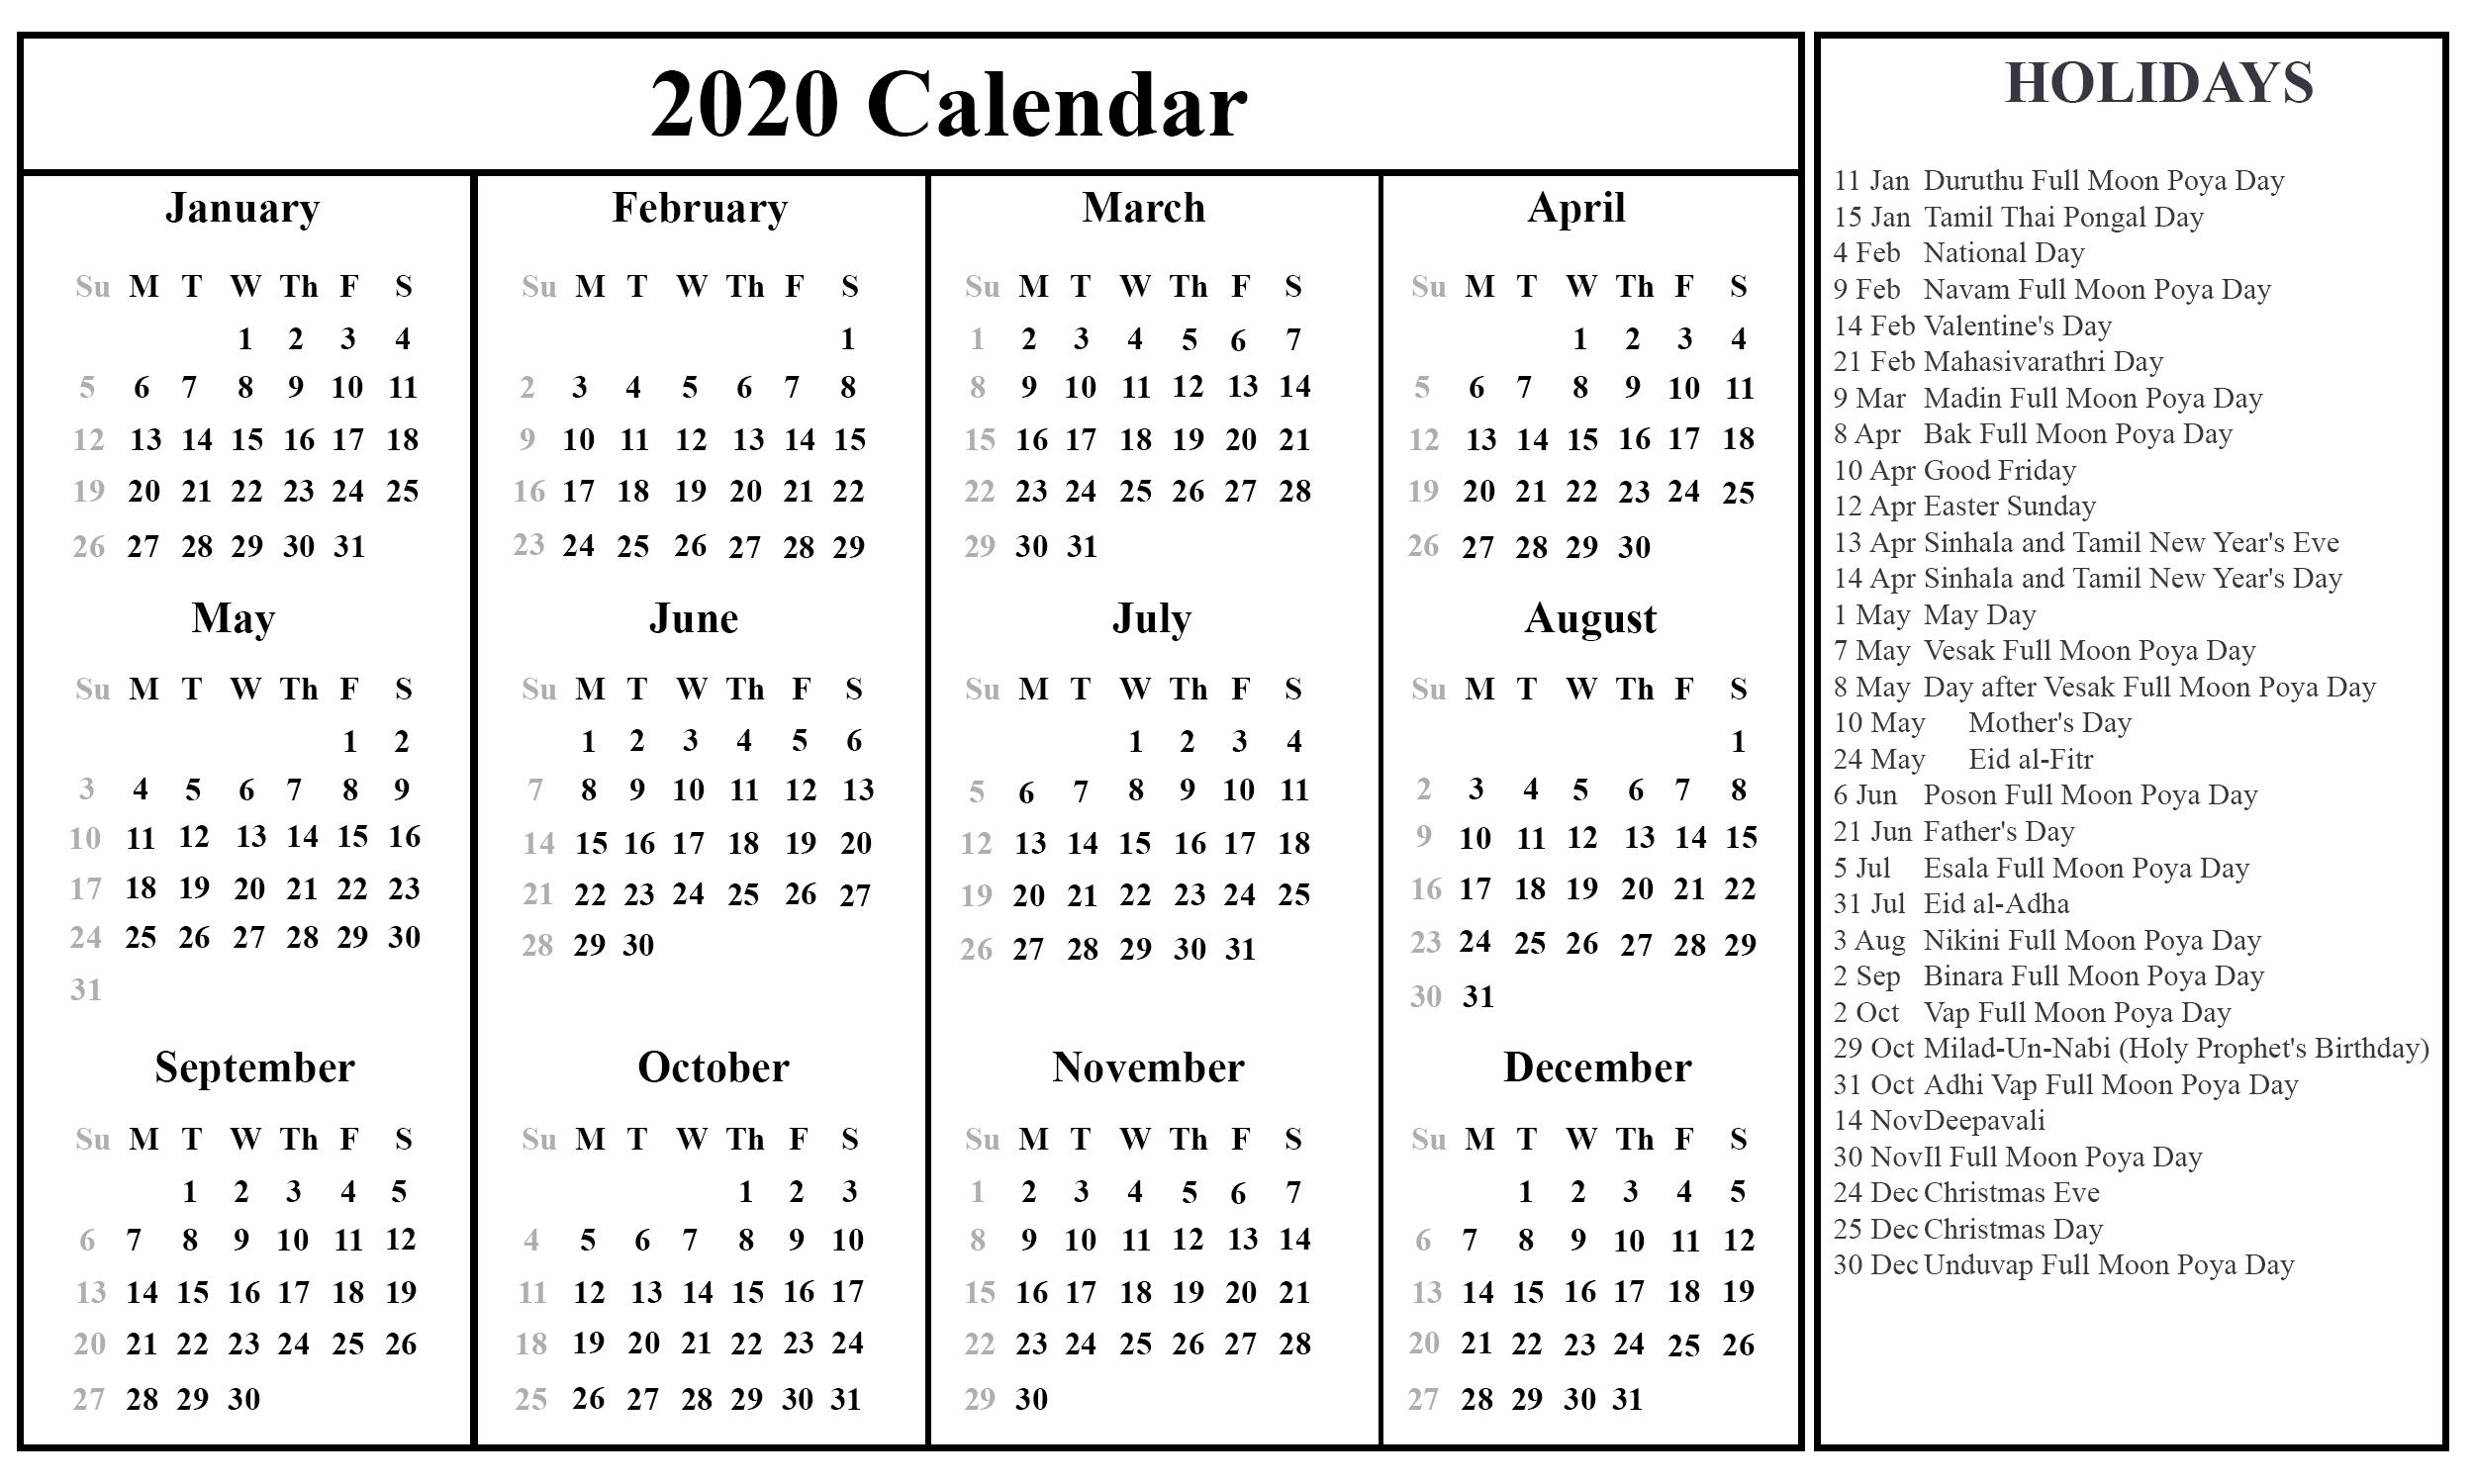 Sri Lanka Calendar 2020 Printable | Printable September throughout 2020 Calendar With Holidays